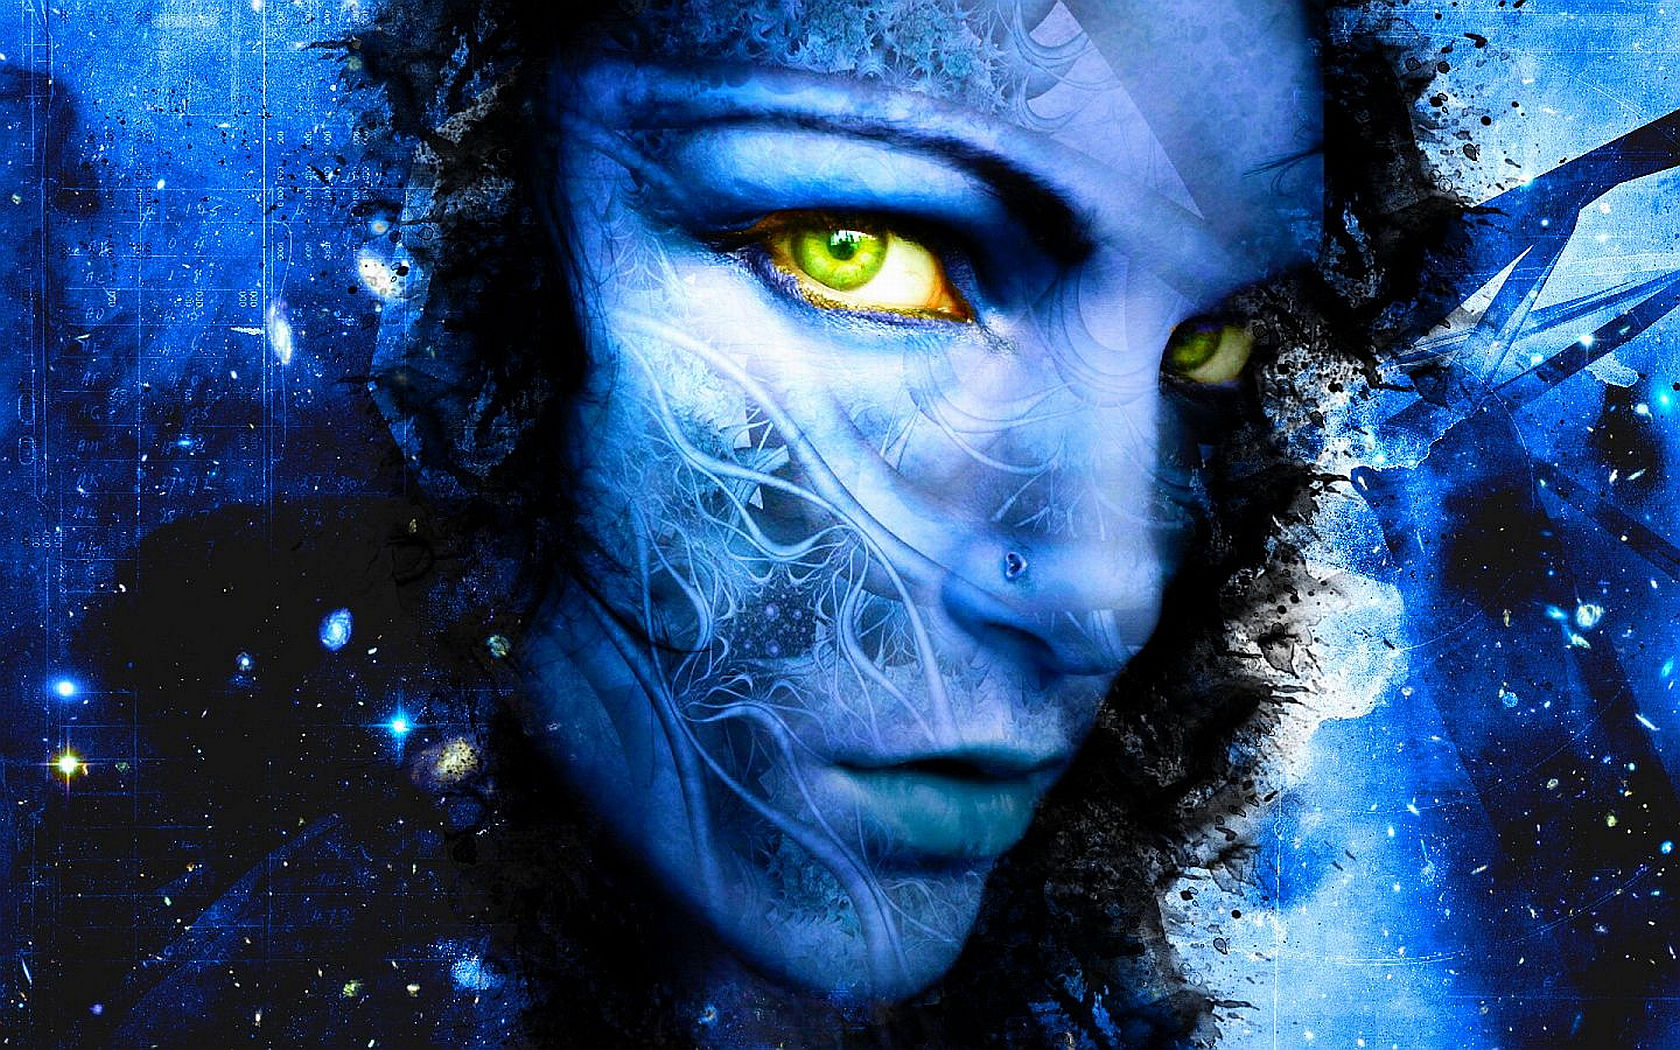 Artistique - Femmes  Bleu Oeil Artistique Fond d'écran